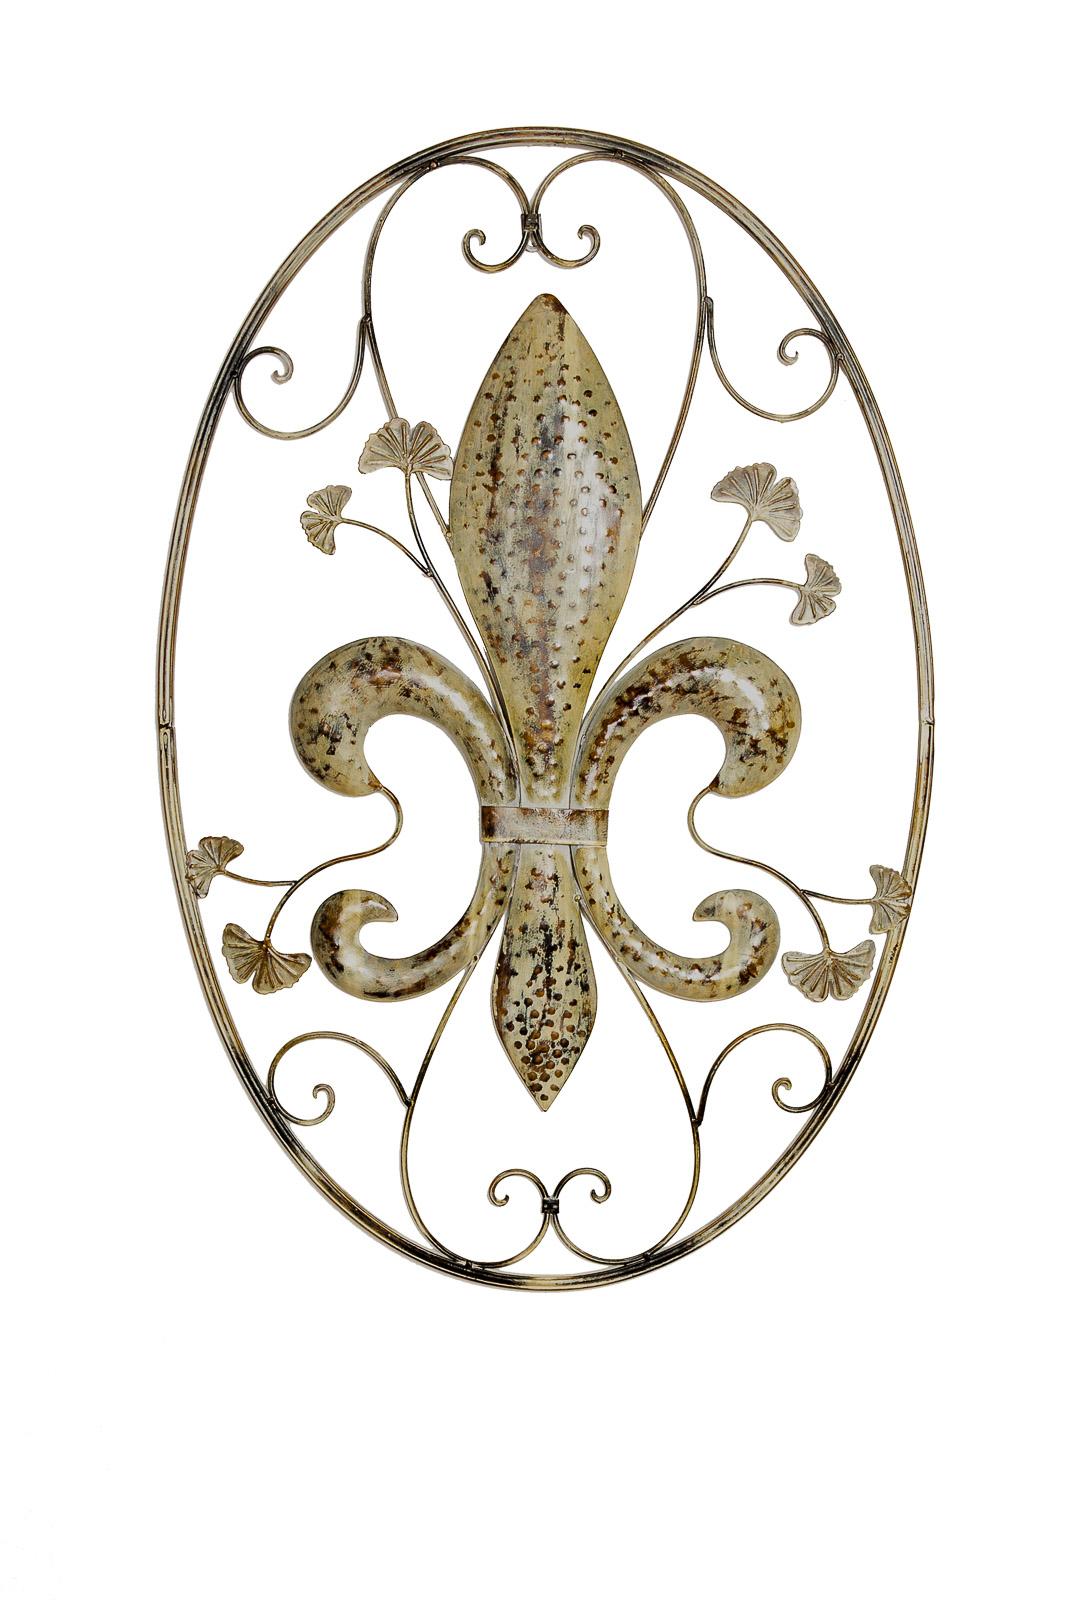 Wanddekoration lilie fenster 82cm metall deko garten terrasse wall decoration aubaho - Wanddekoration metall ...